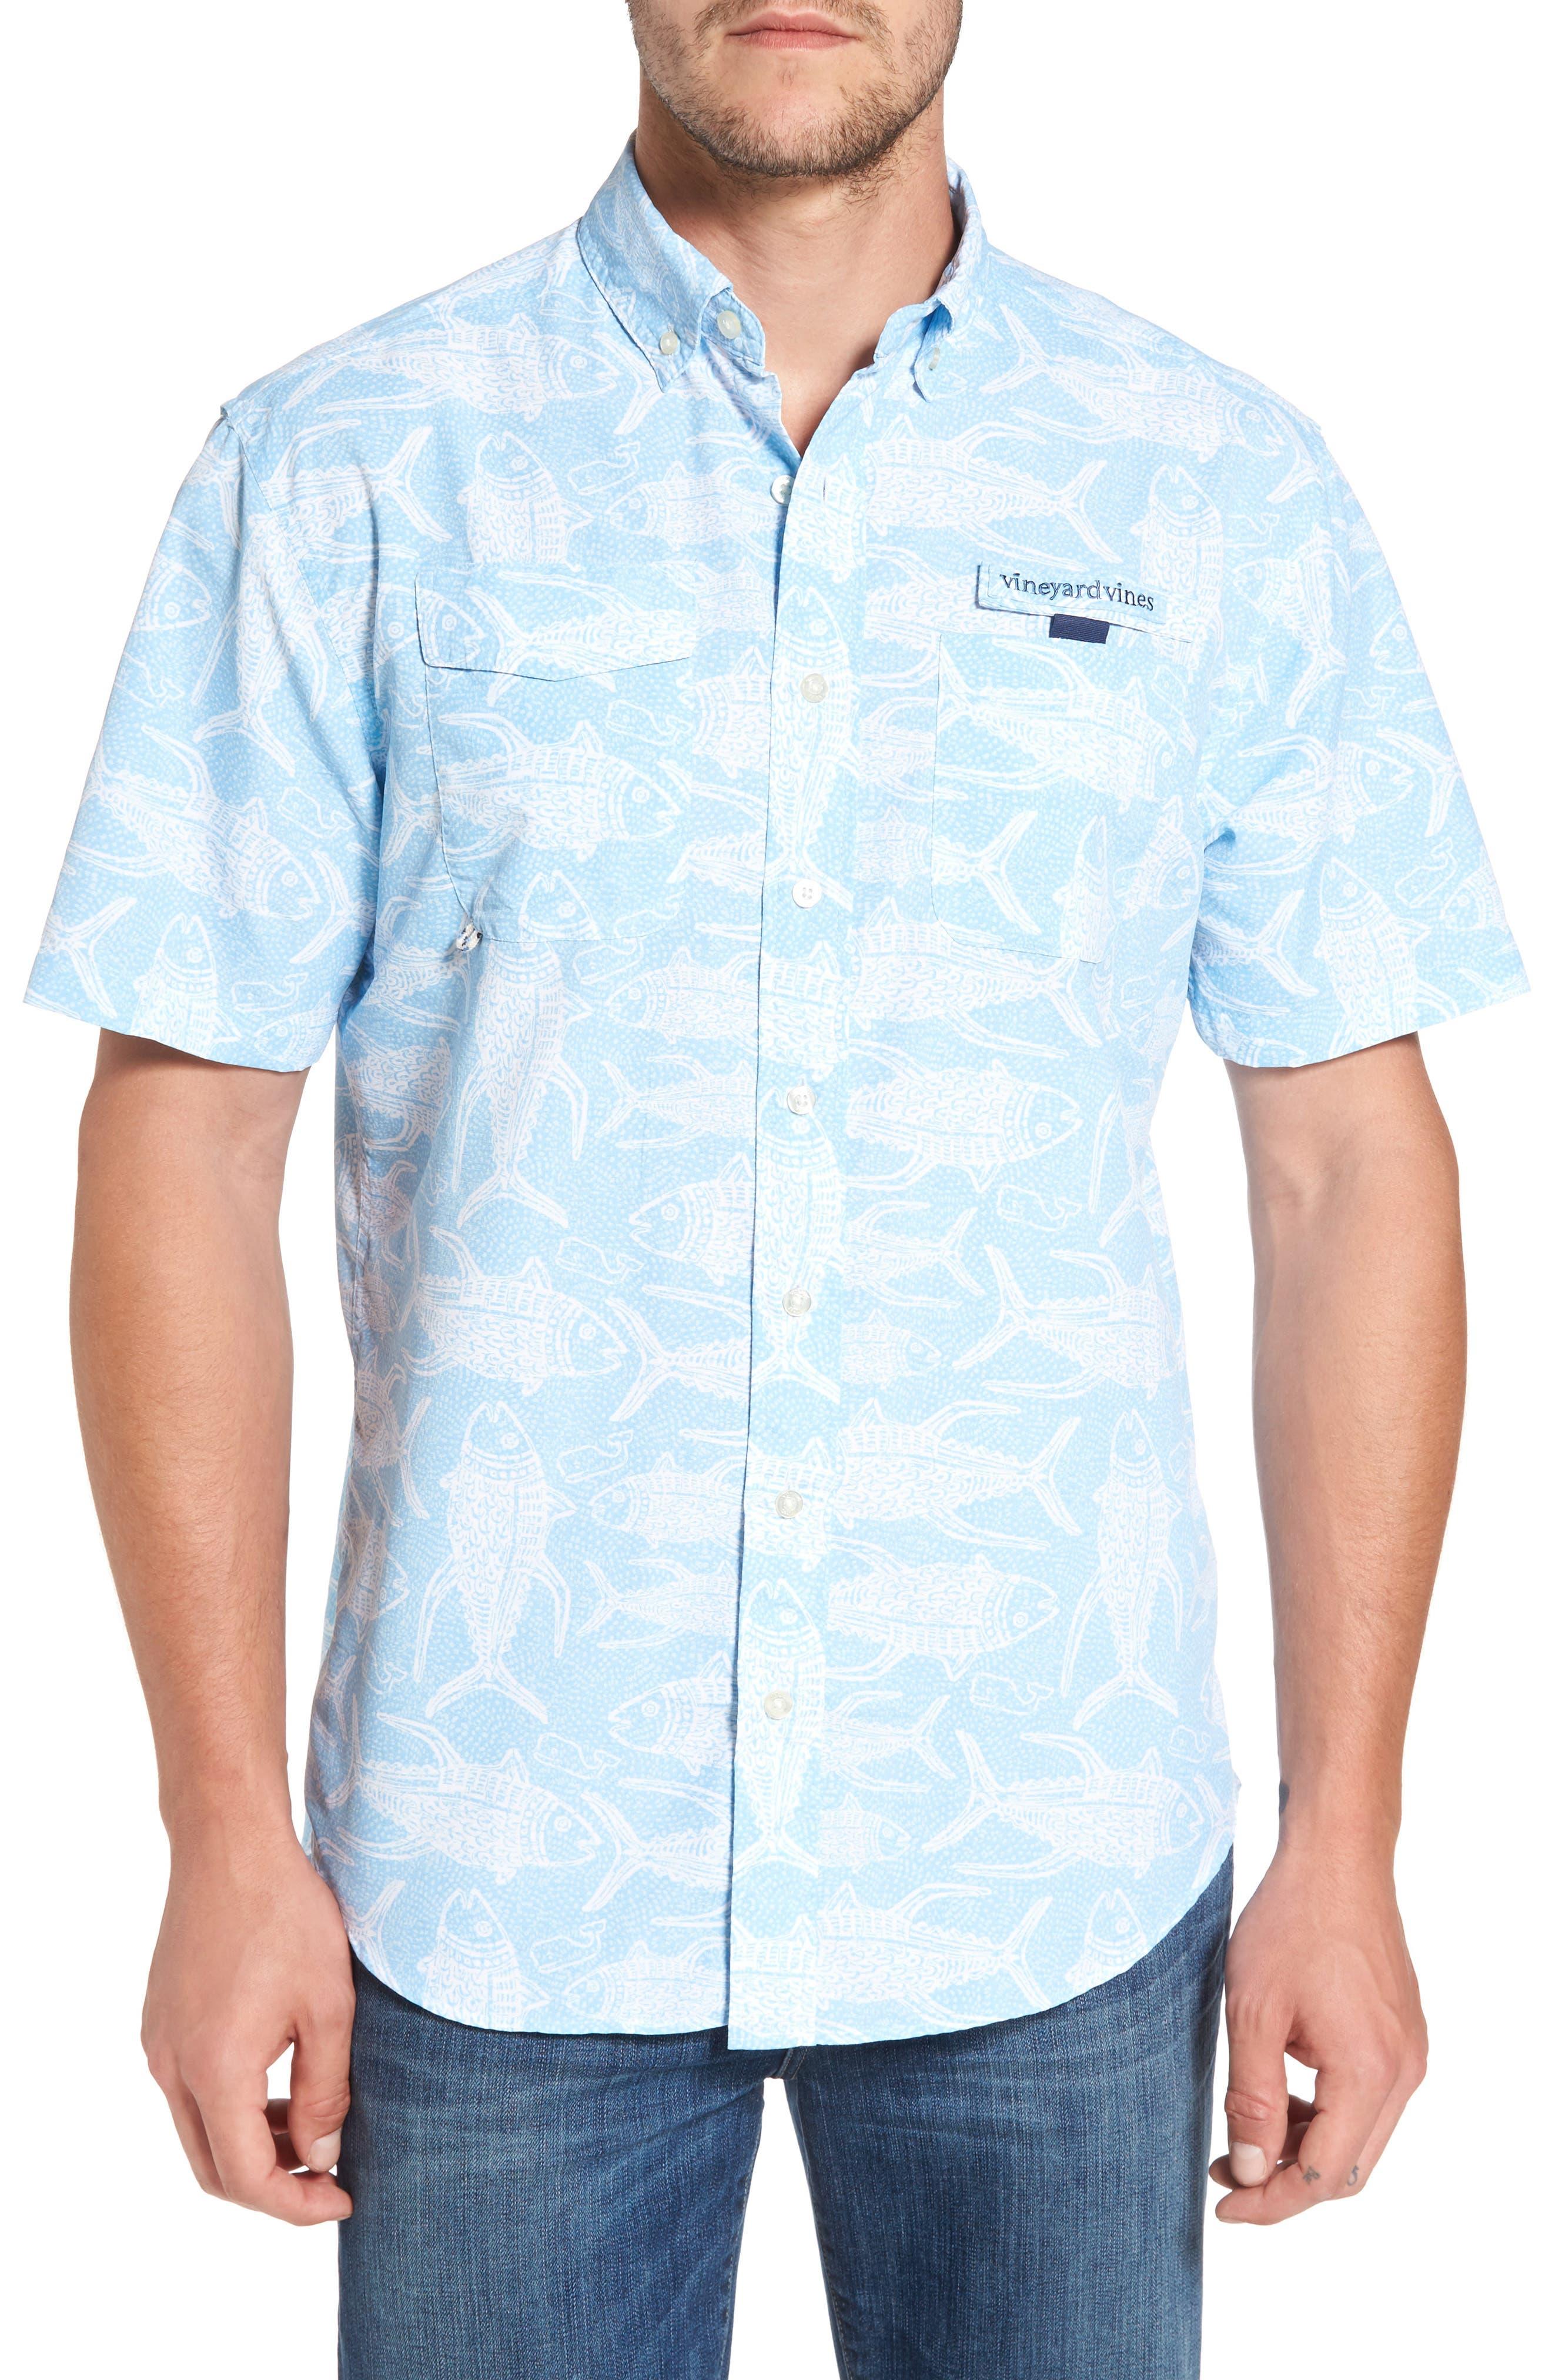 Alternate Image 1 Selected - Vineyard Vines Tuna Batic Harbor Short Sleeve Sport Shirt